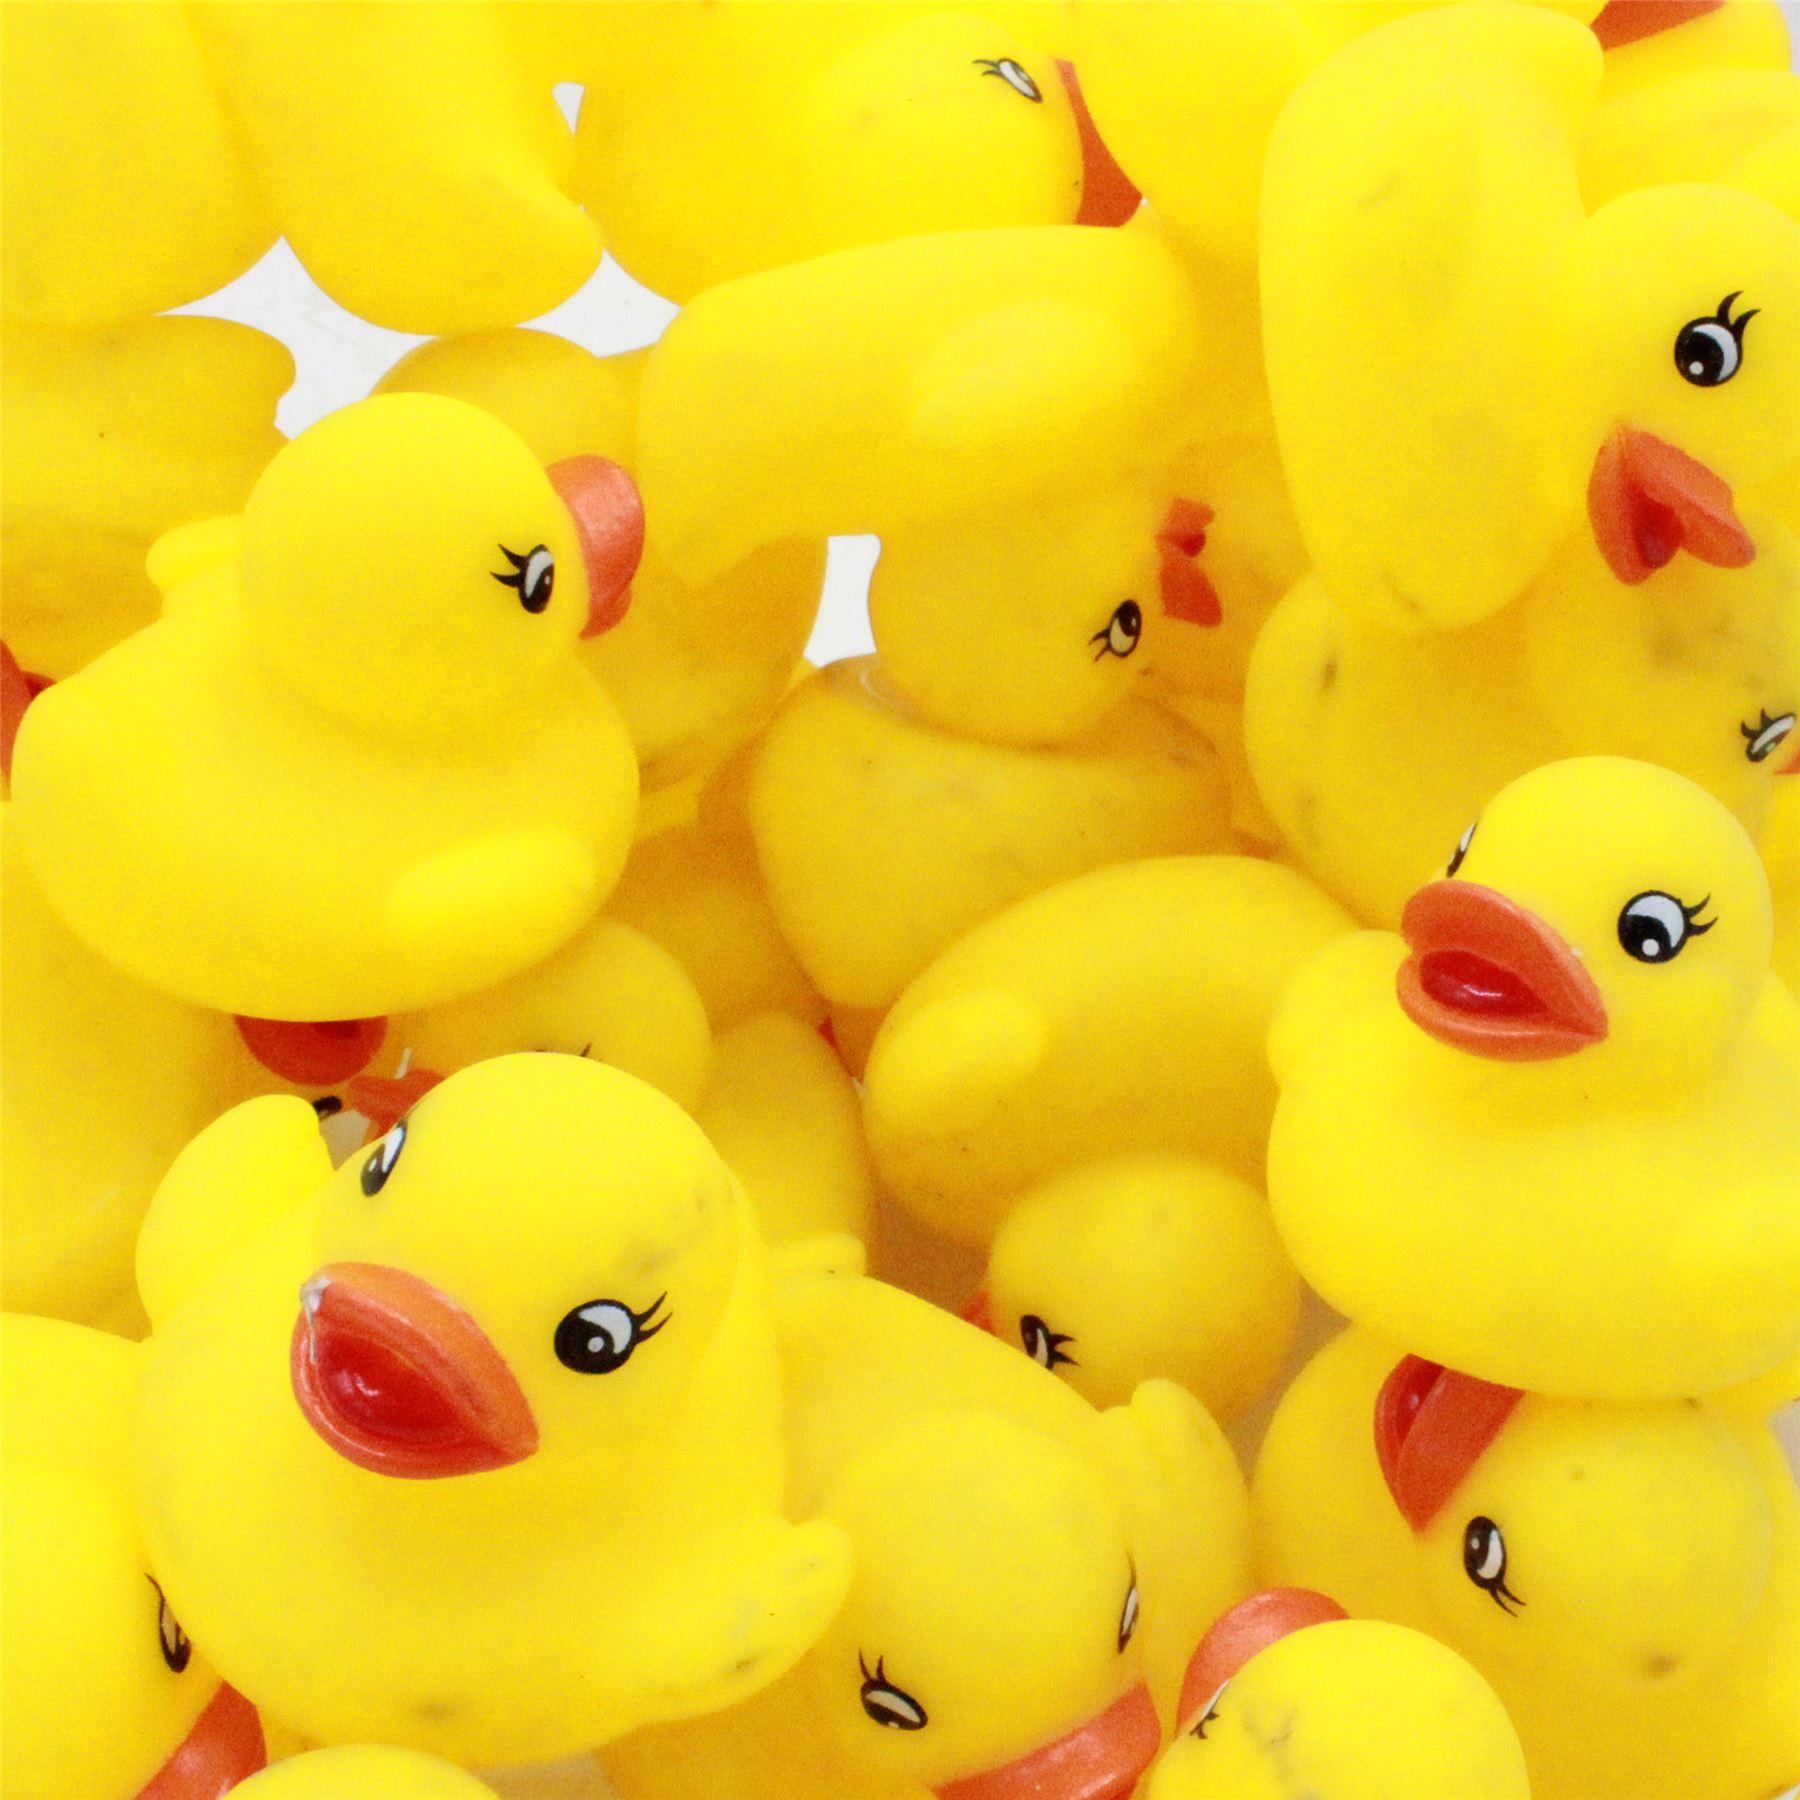 4x Baby Rubber Duck Bath Toys 5cm Small Yellow Ducks | eBay